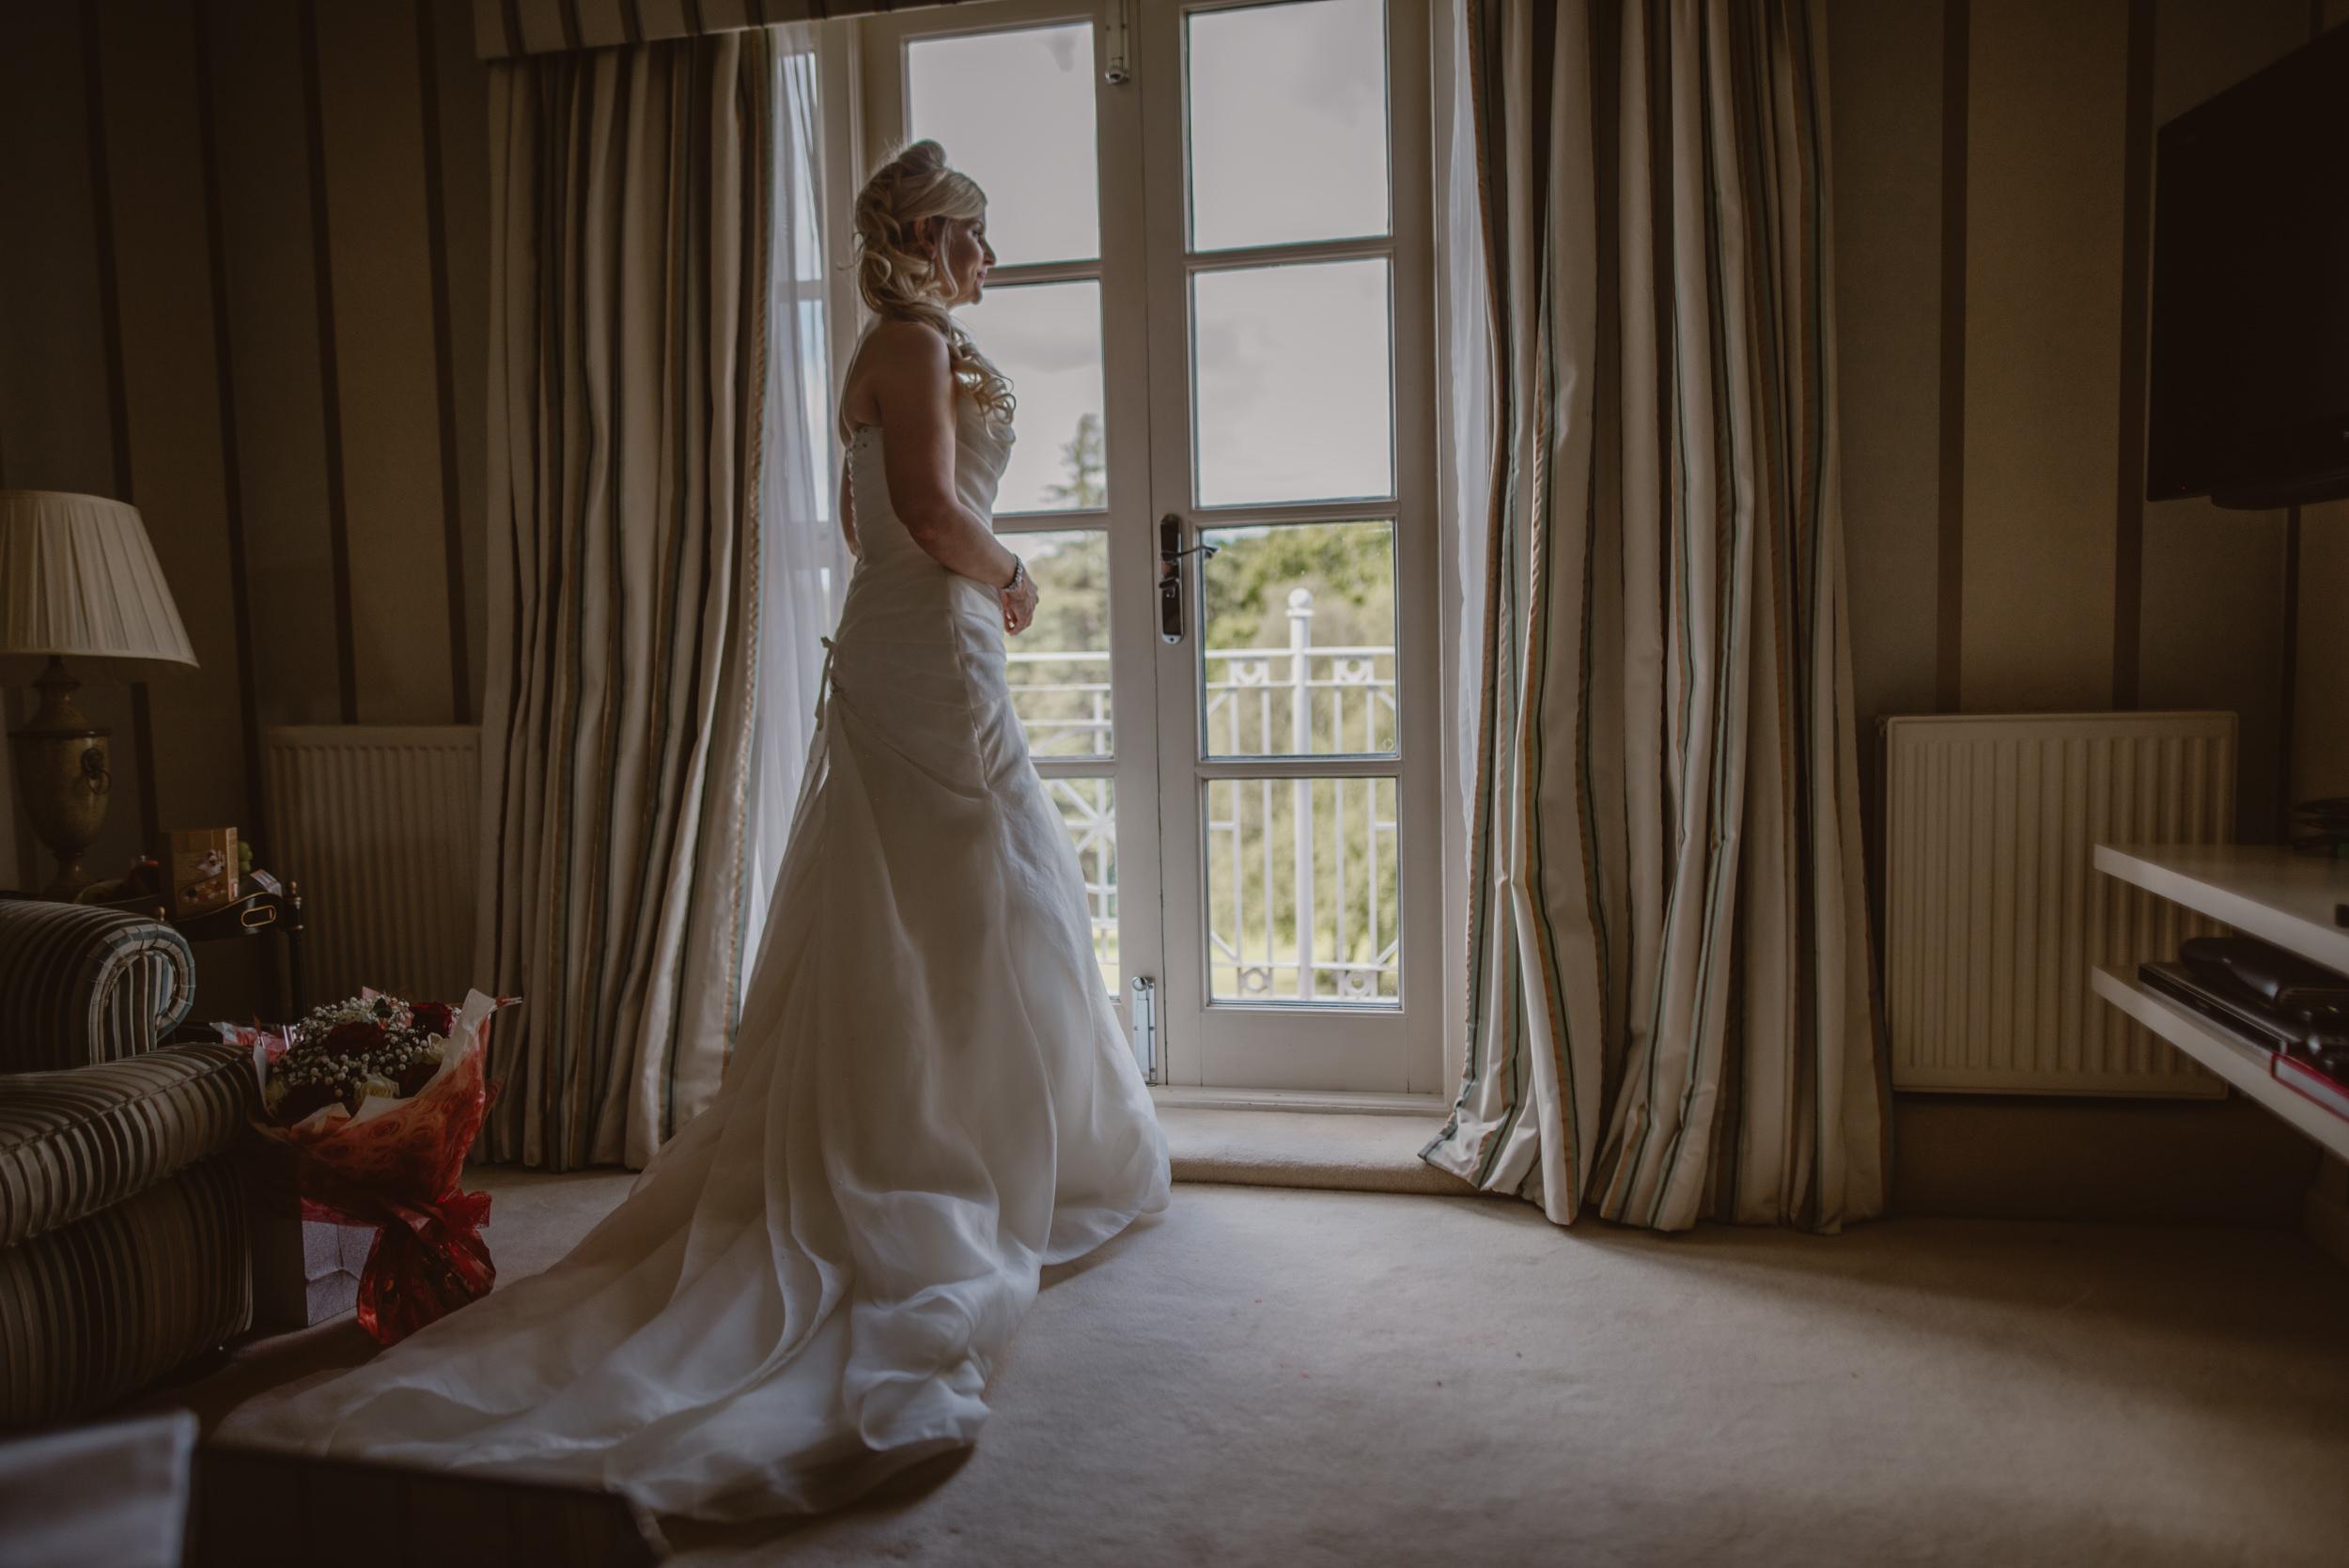 Trisha-and-Roger-wedding-The-Priory-Church-and-Chewton-Glen-Hotel-Christchurch-Manu-Mendoza-Wedding-Photography-070.jpg